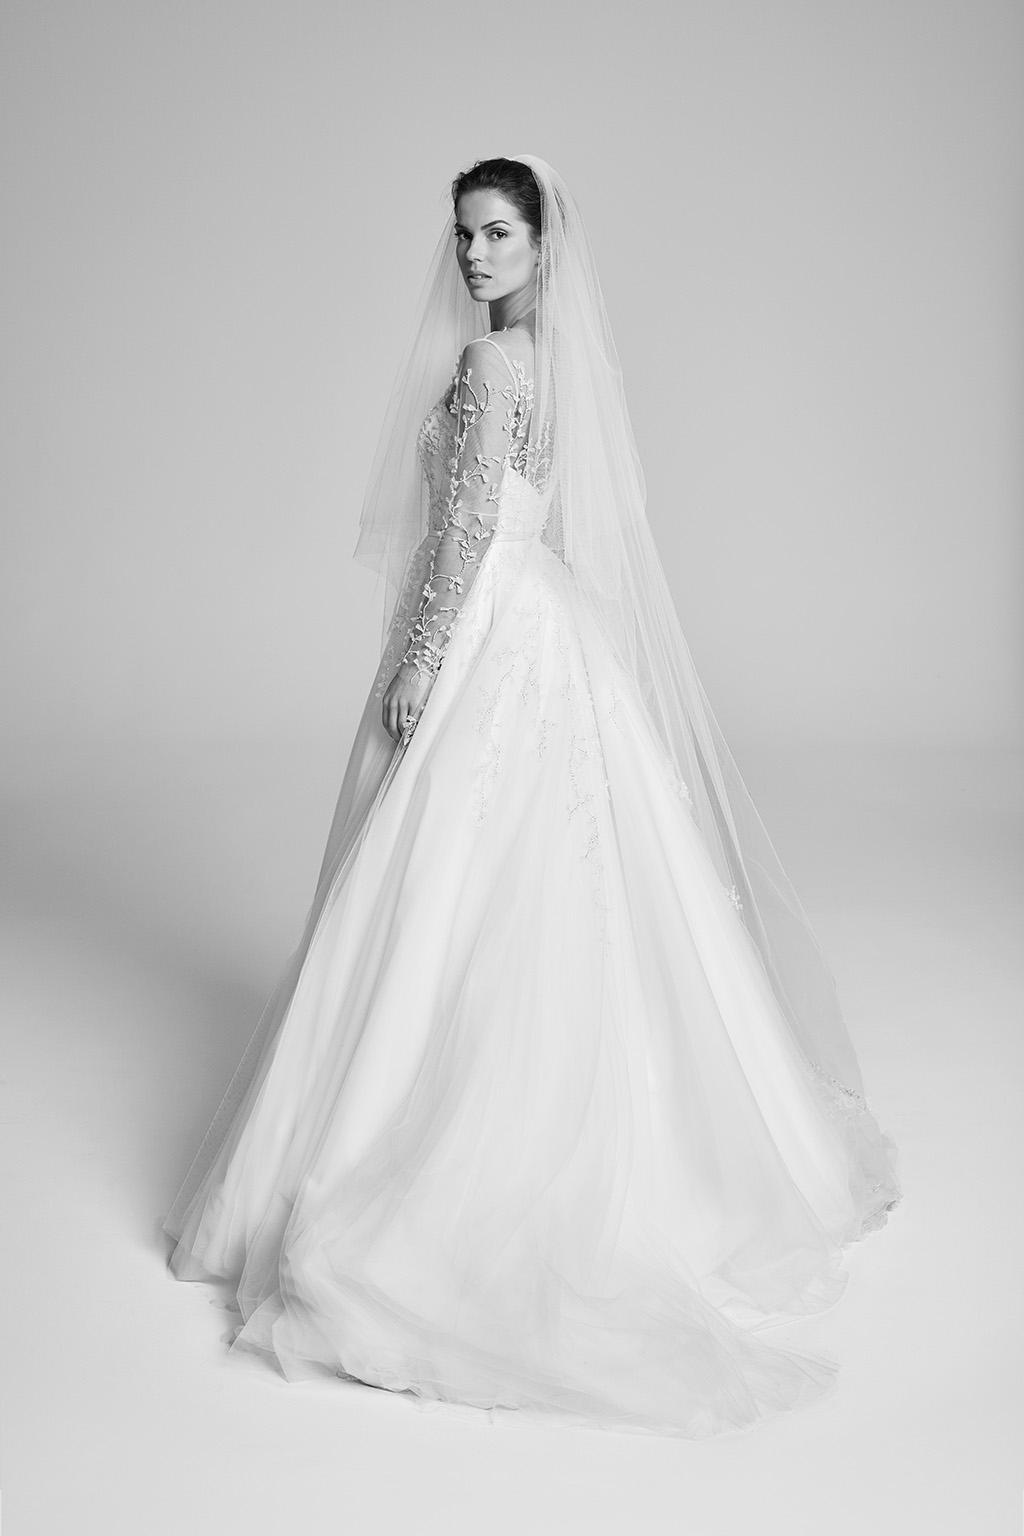 astoria-back-bridalcouture-wedding-dresses-uk-belle-epoque-collection-2018-by-designer-suzanne-neville